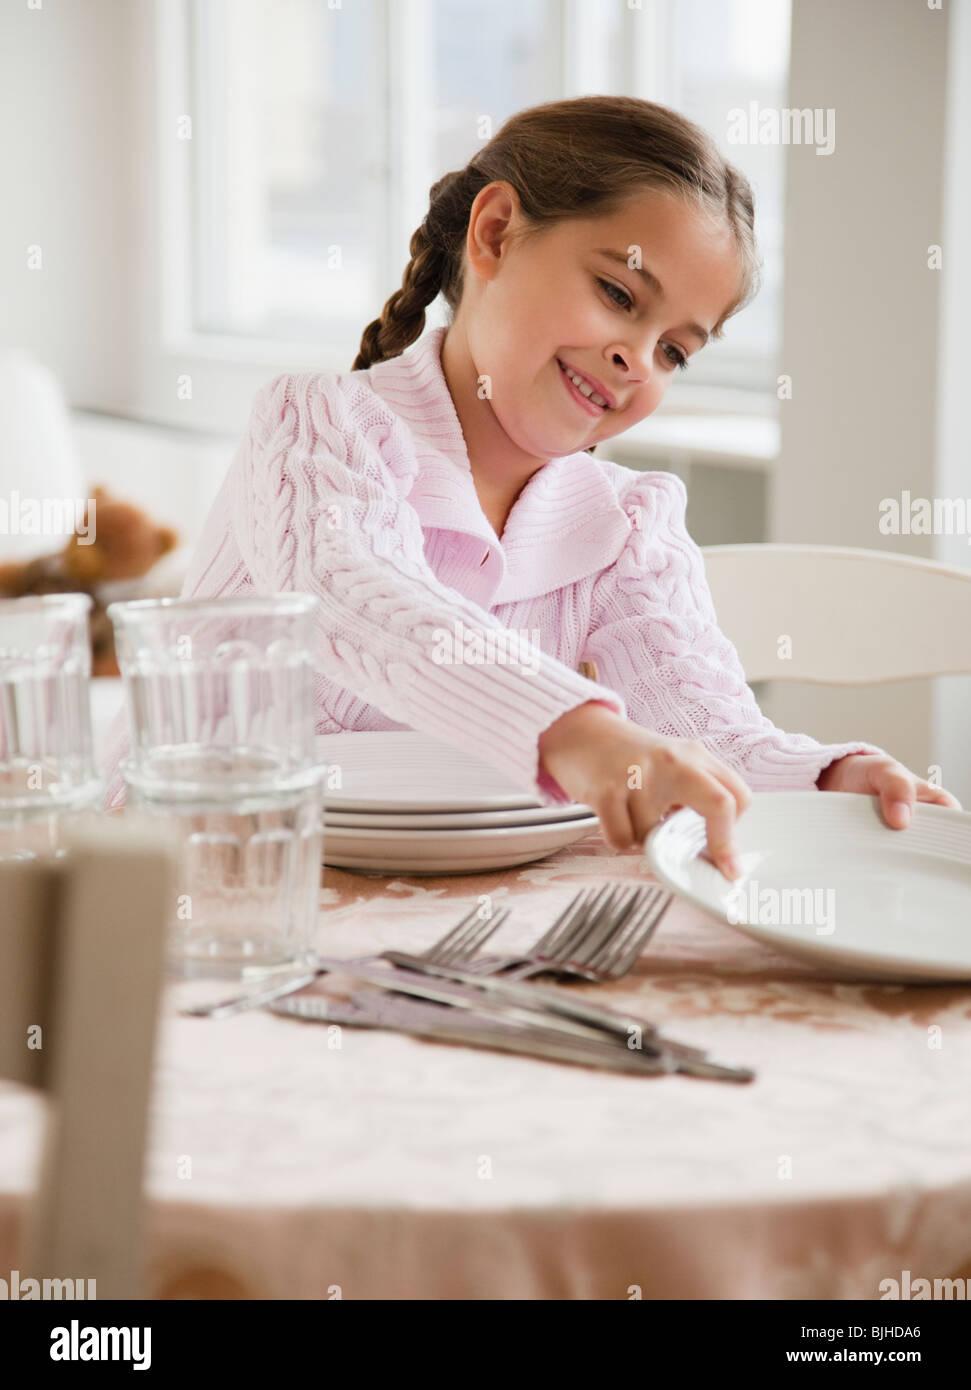 Young Girl Setting Table Stock Photo Alamy